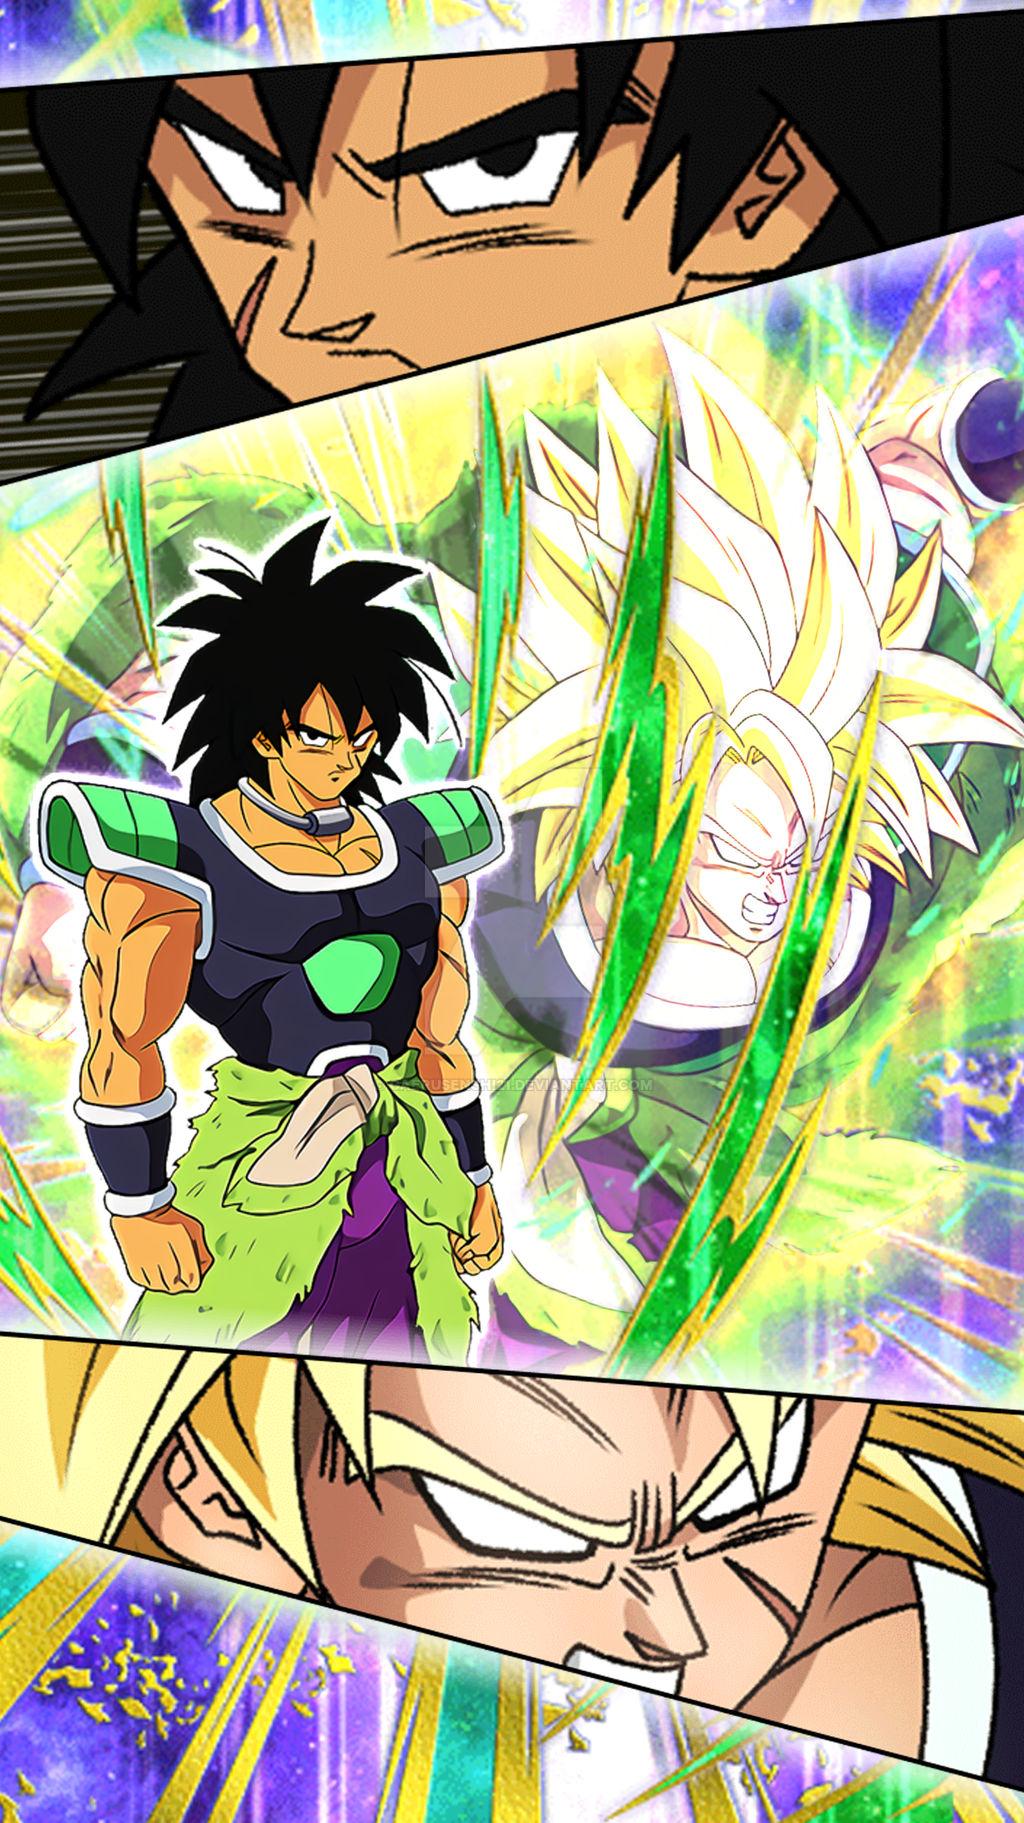 Wallpaper Broly Dragon Ball Z Dokkan Battle 2 By Gaerusenshi21